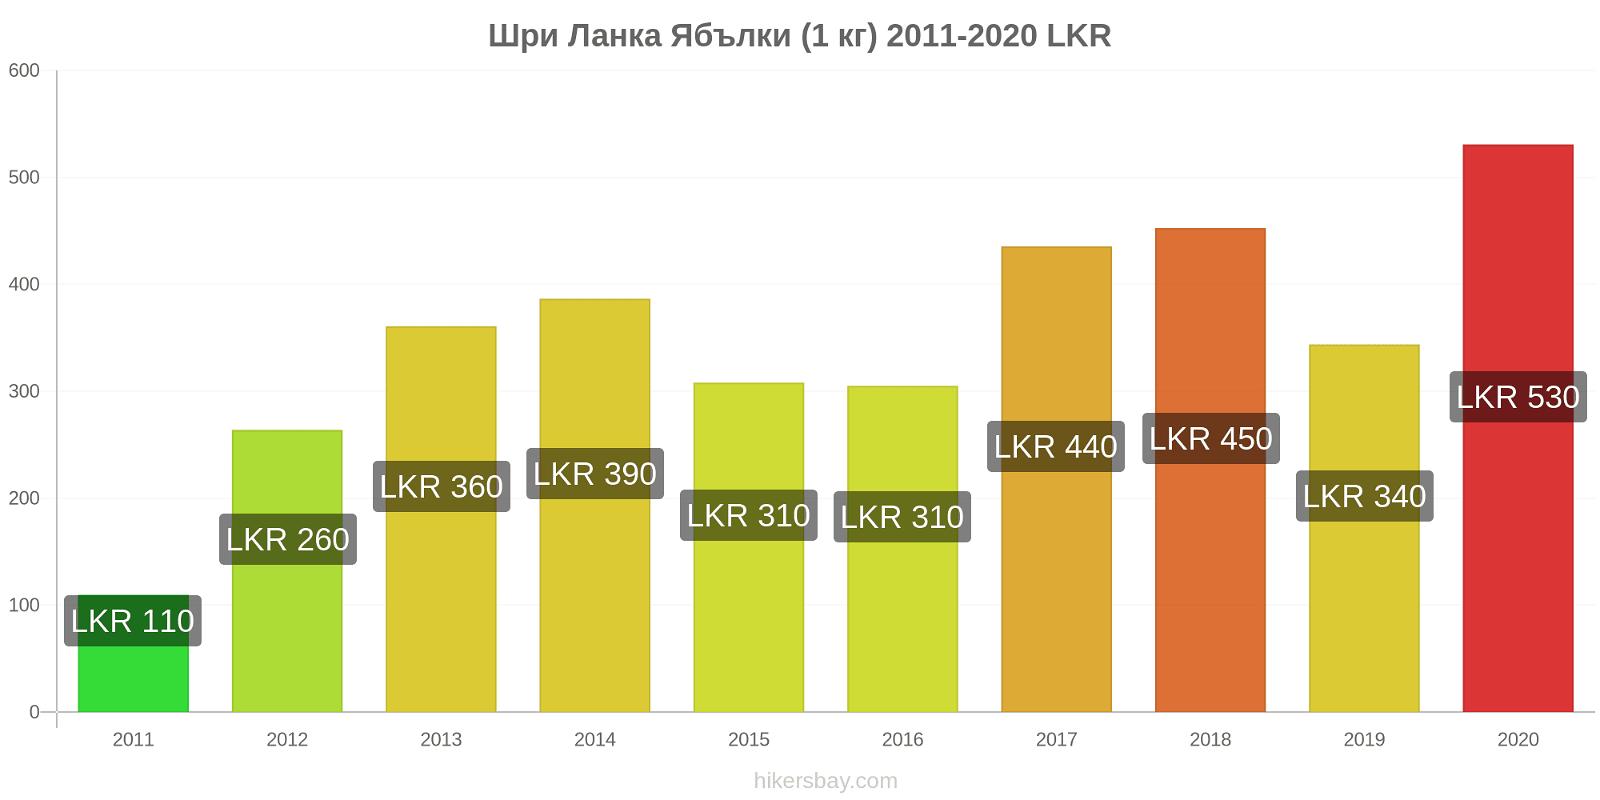 Шри Ланка ценови промени Ябълки (1 кг) hikersbay.com